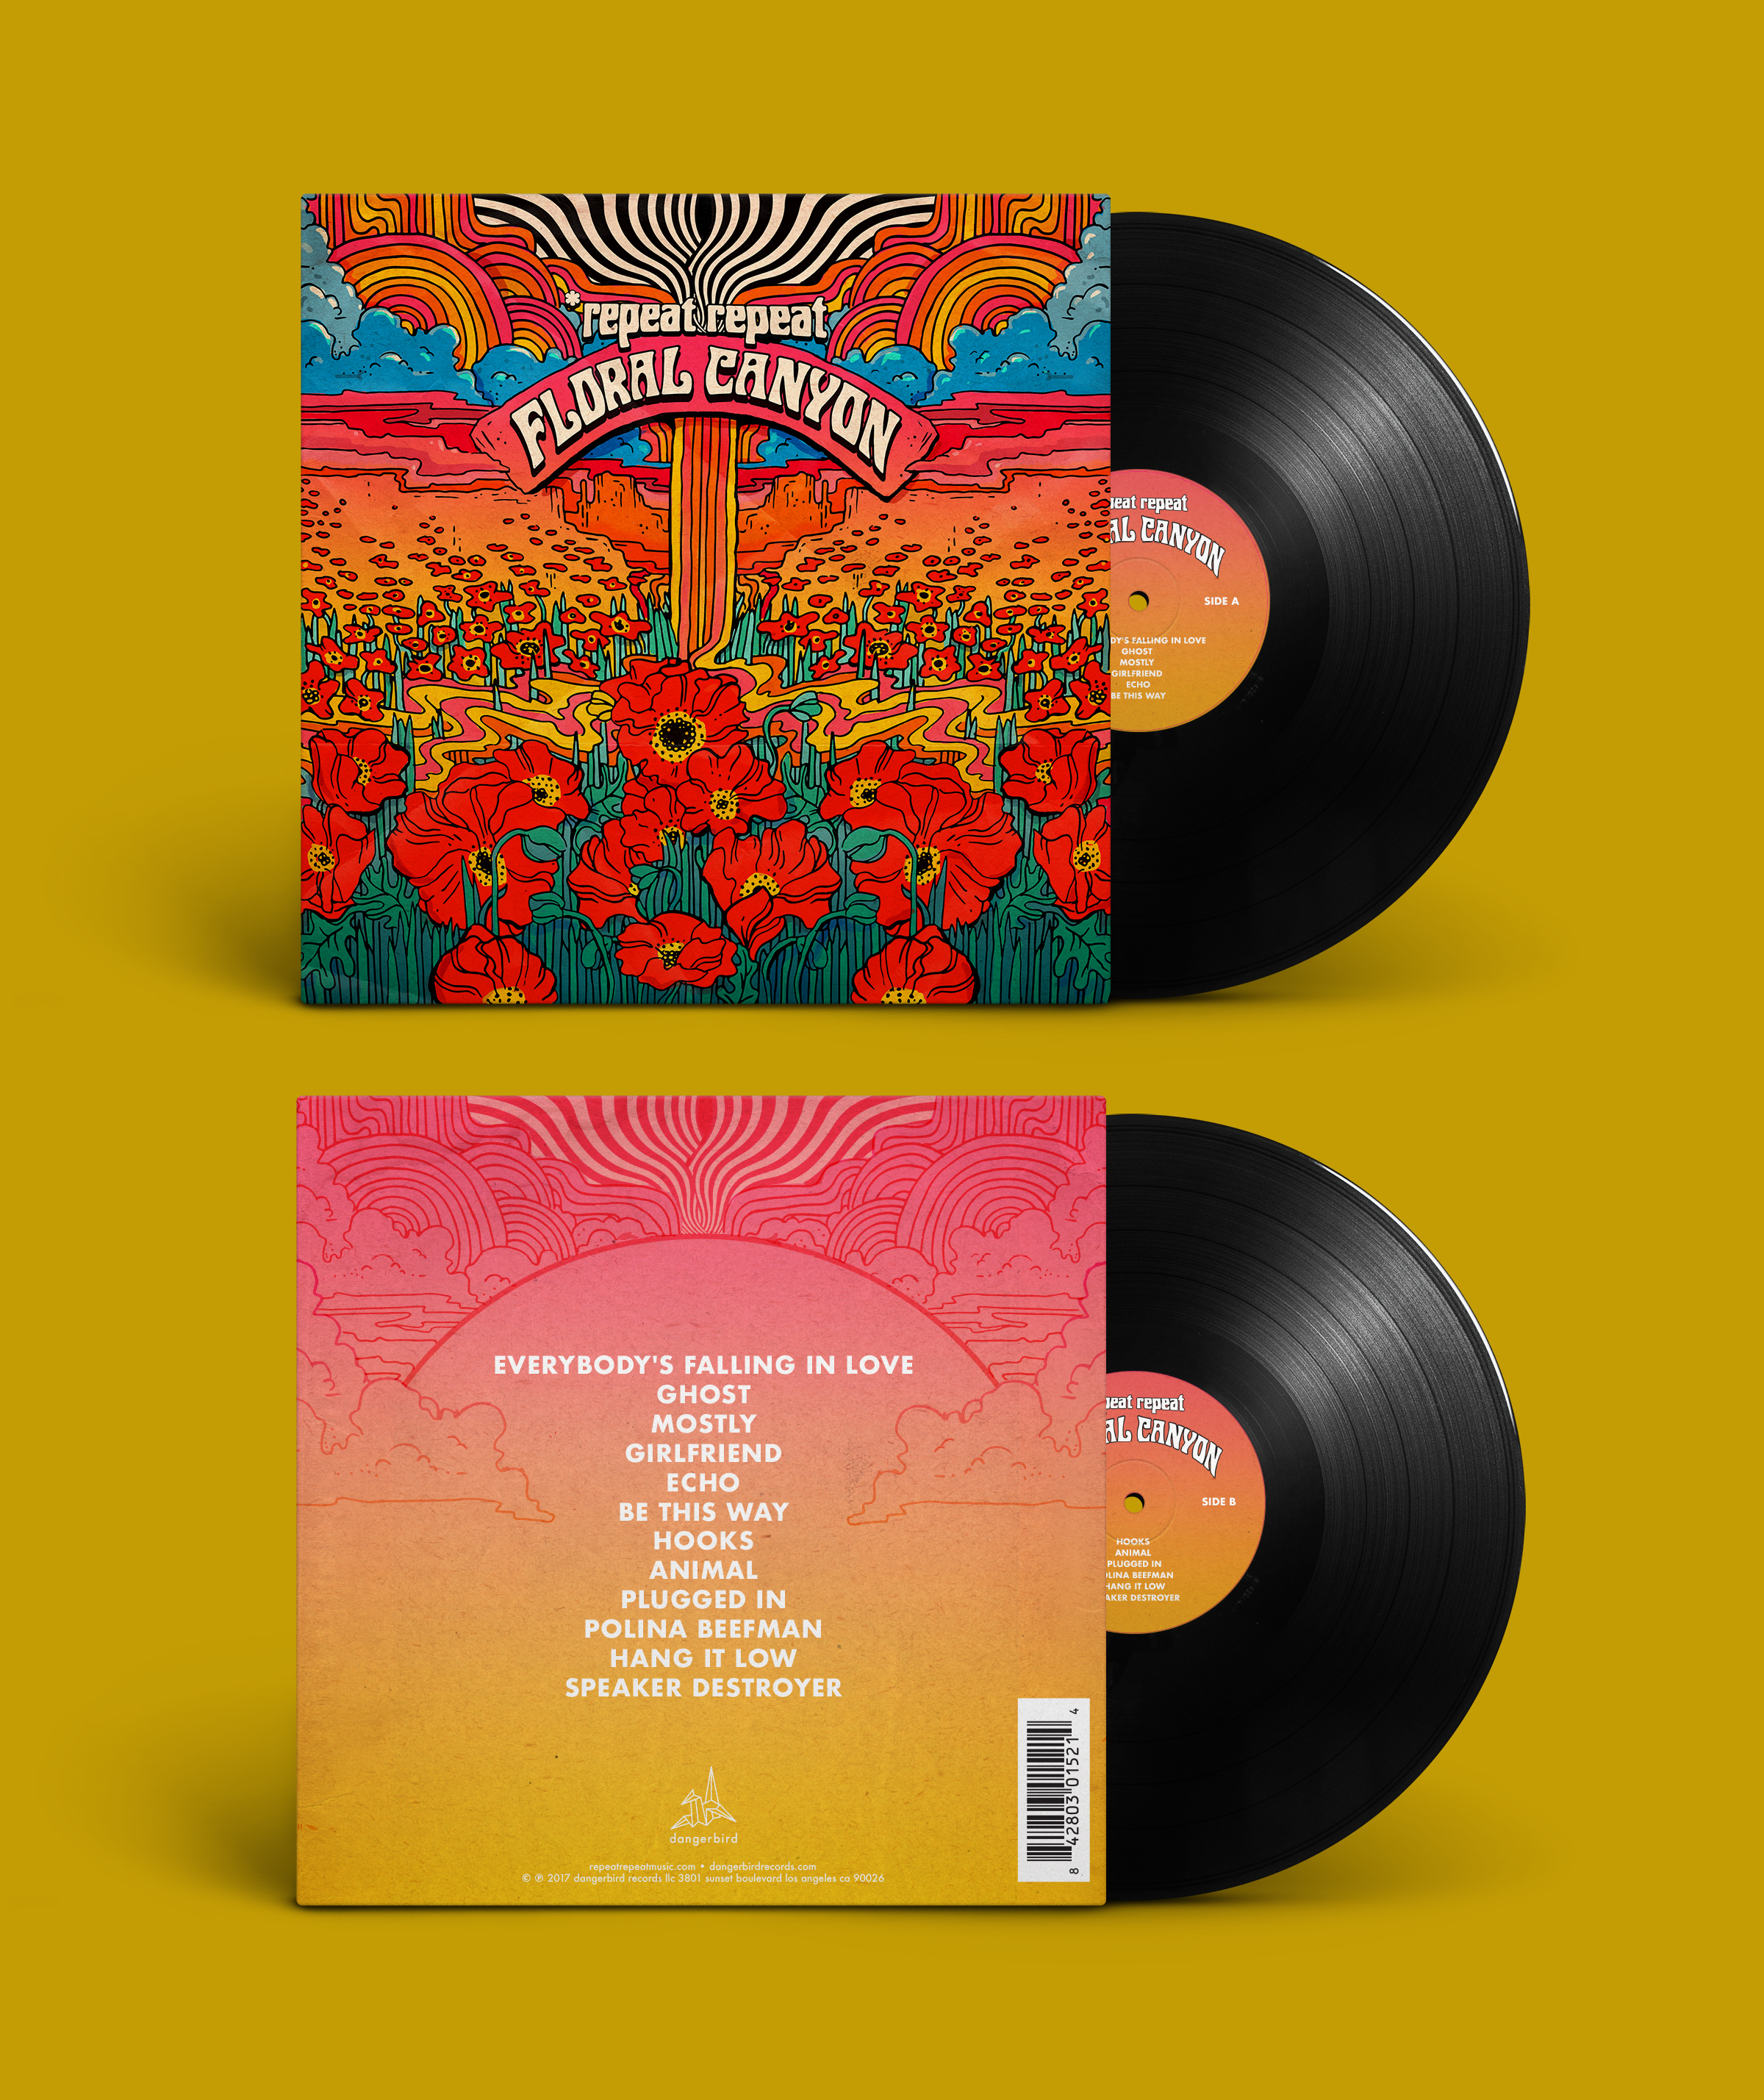 Floral Canyon - Vinyl, CD, Shirts, and more!